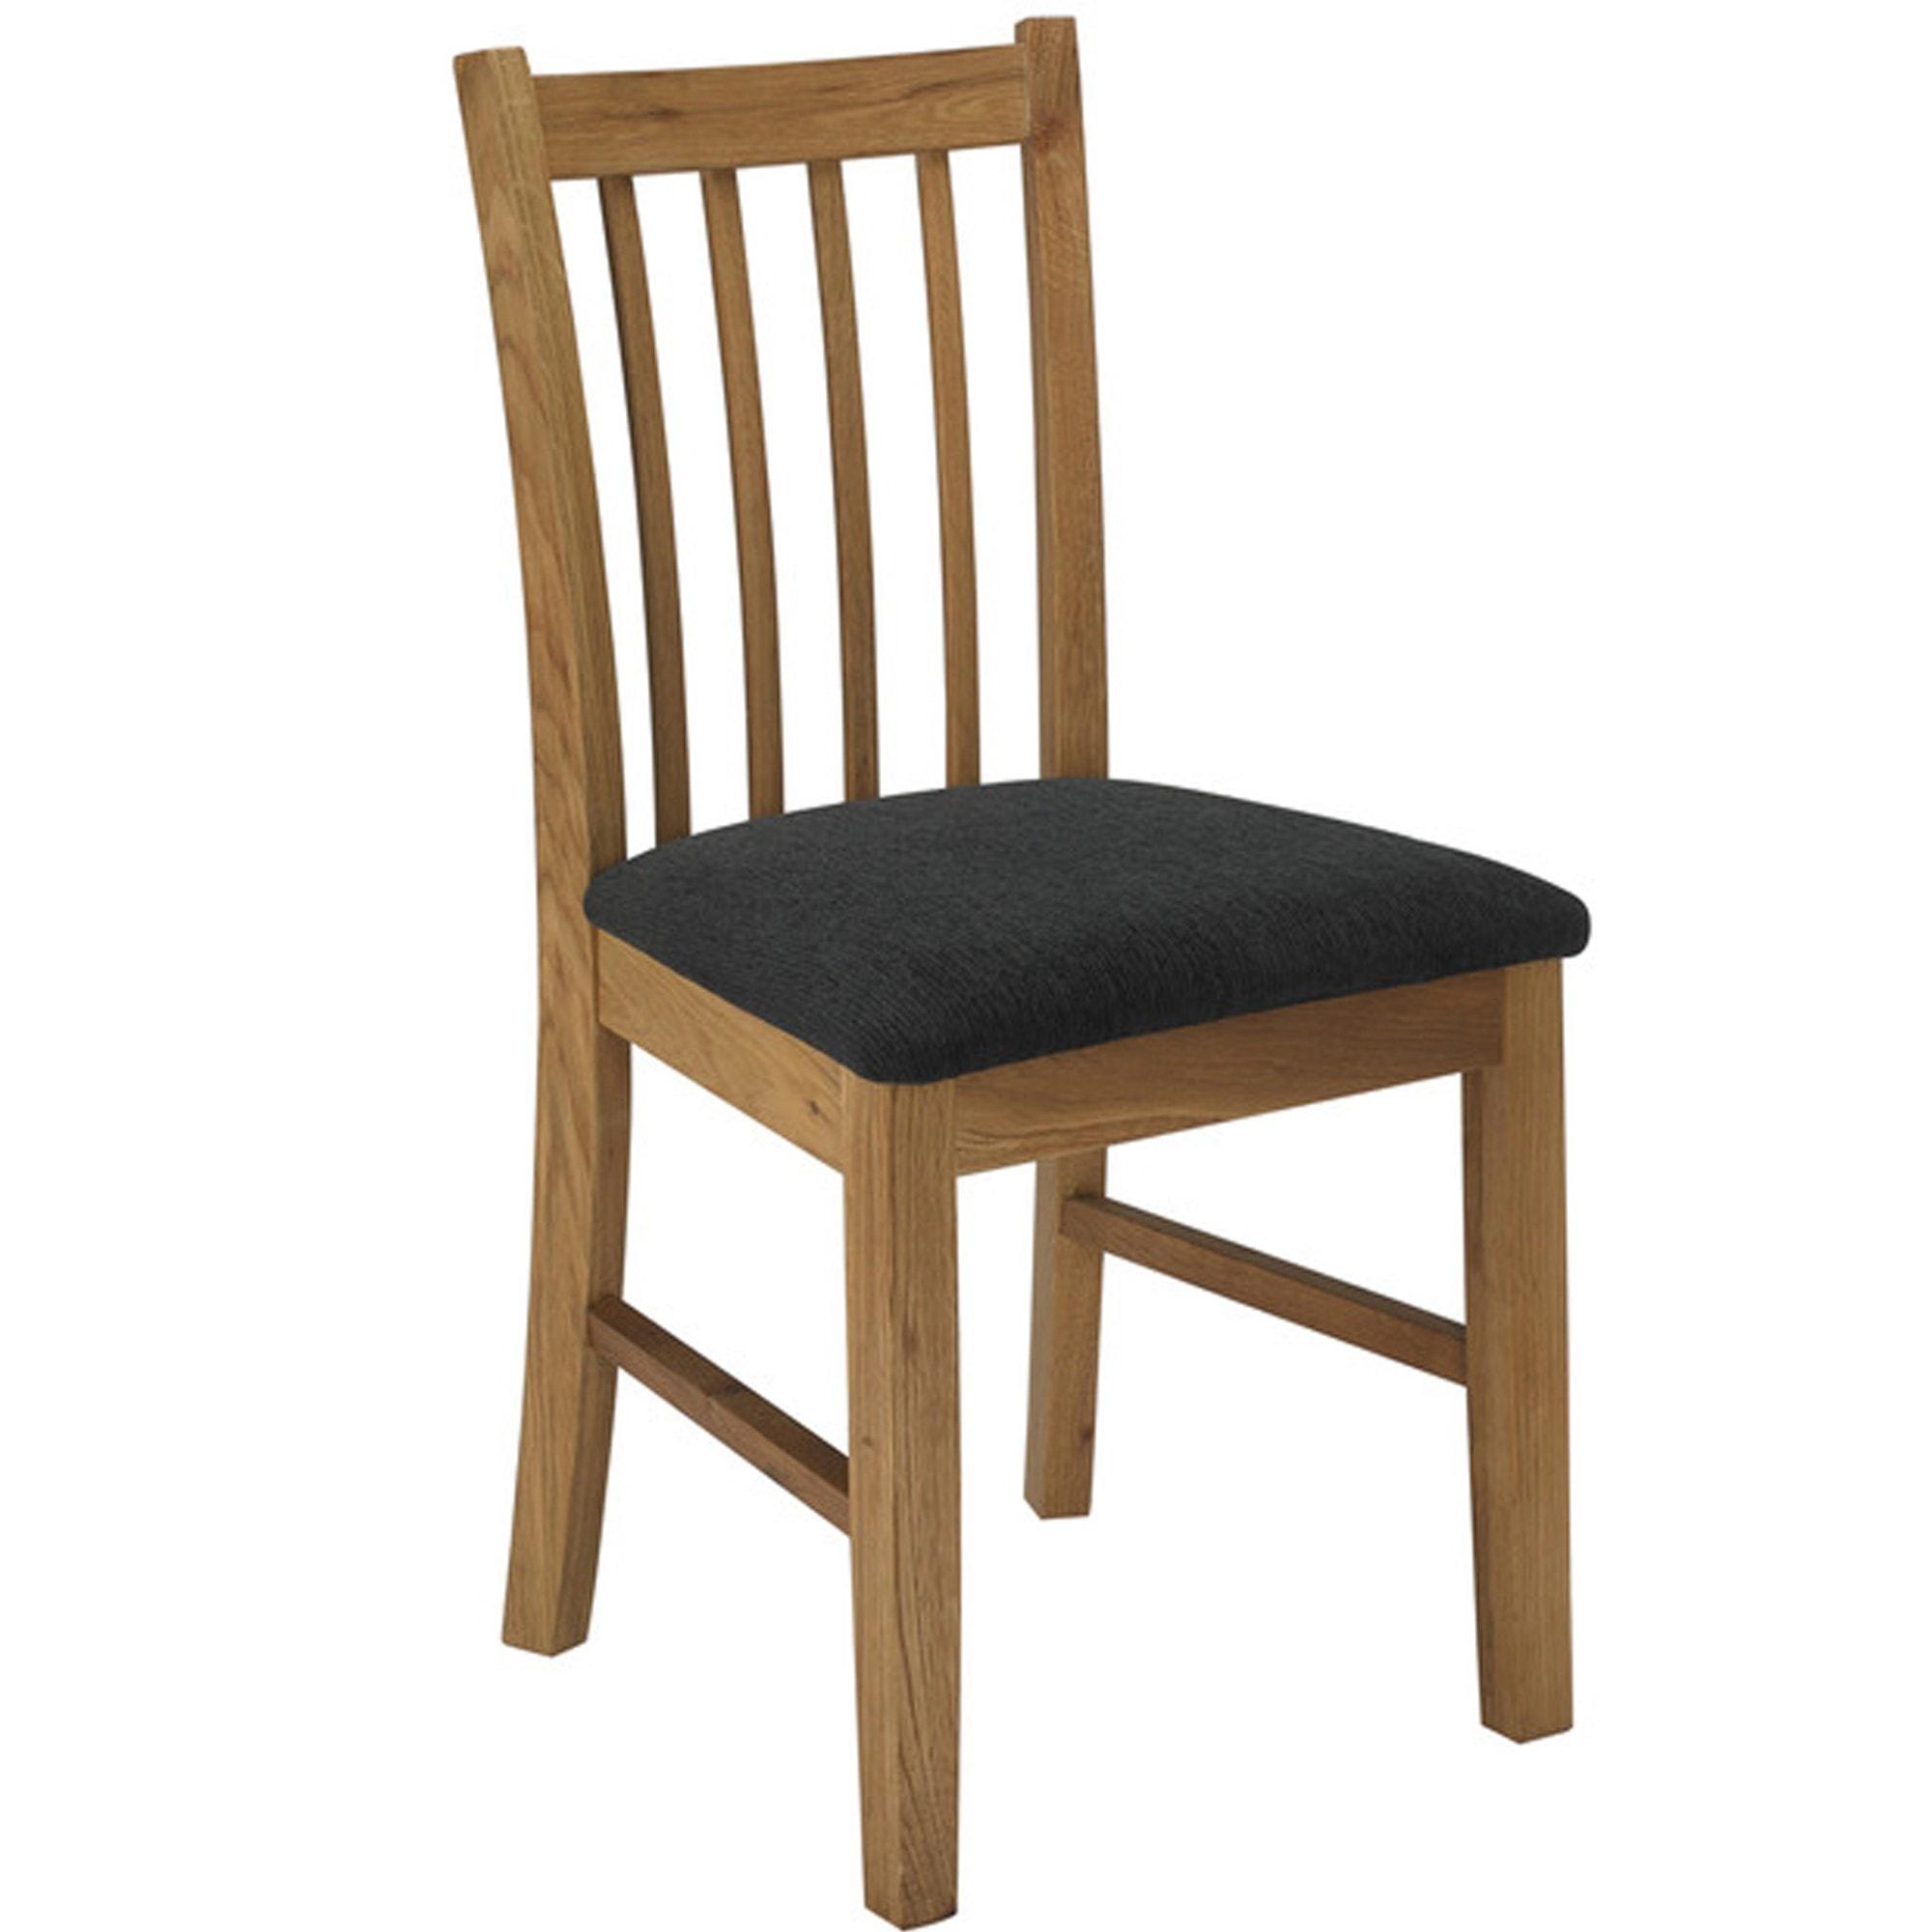 Peachy Brooklyn Dining Chair Pack Of 2 Cjindustries Chair Design For Home Cjindustriesco